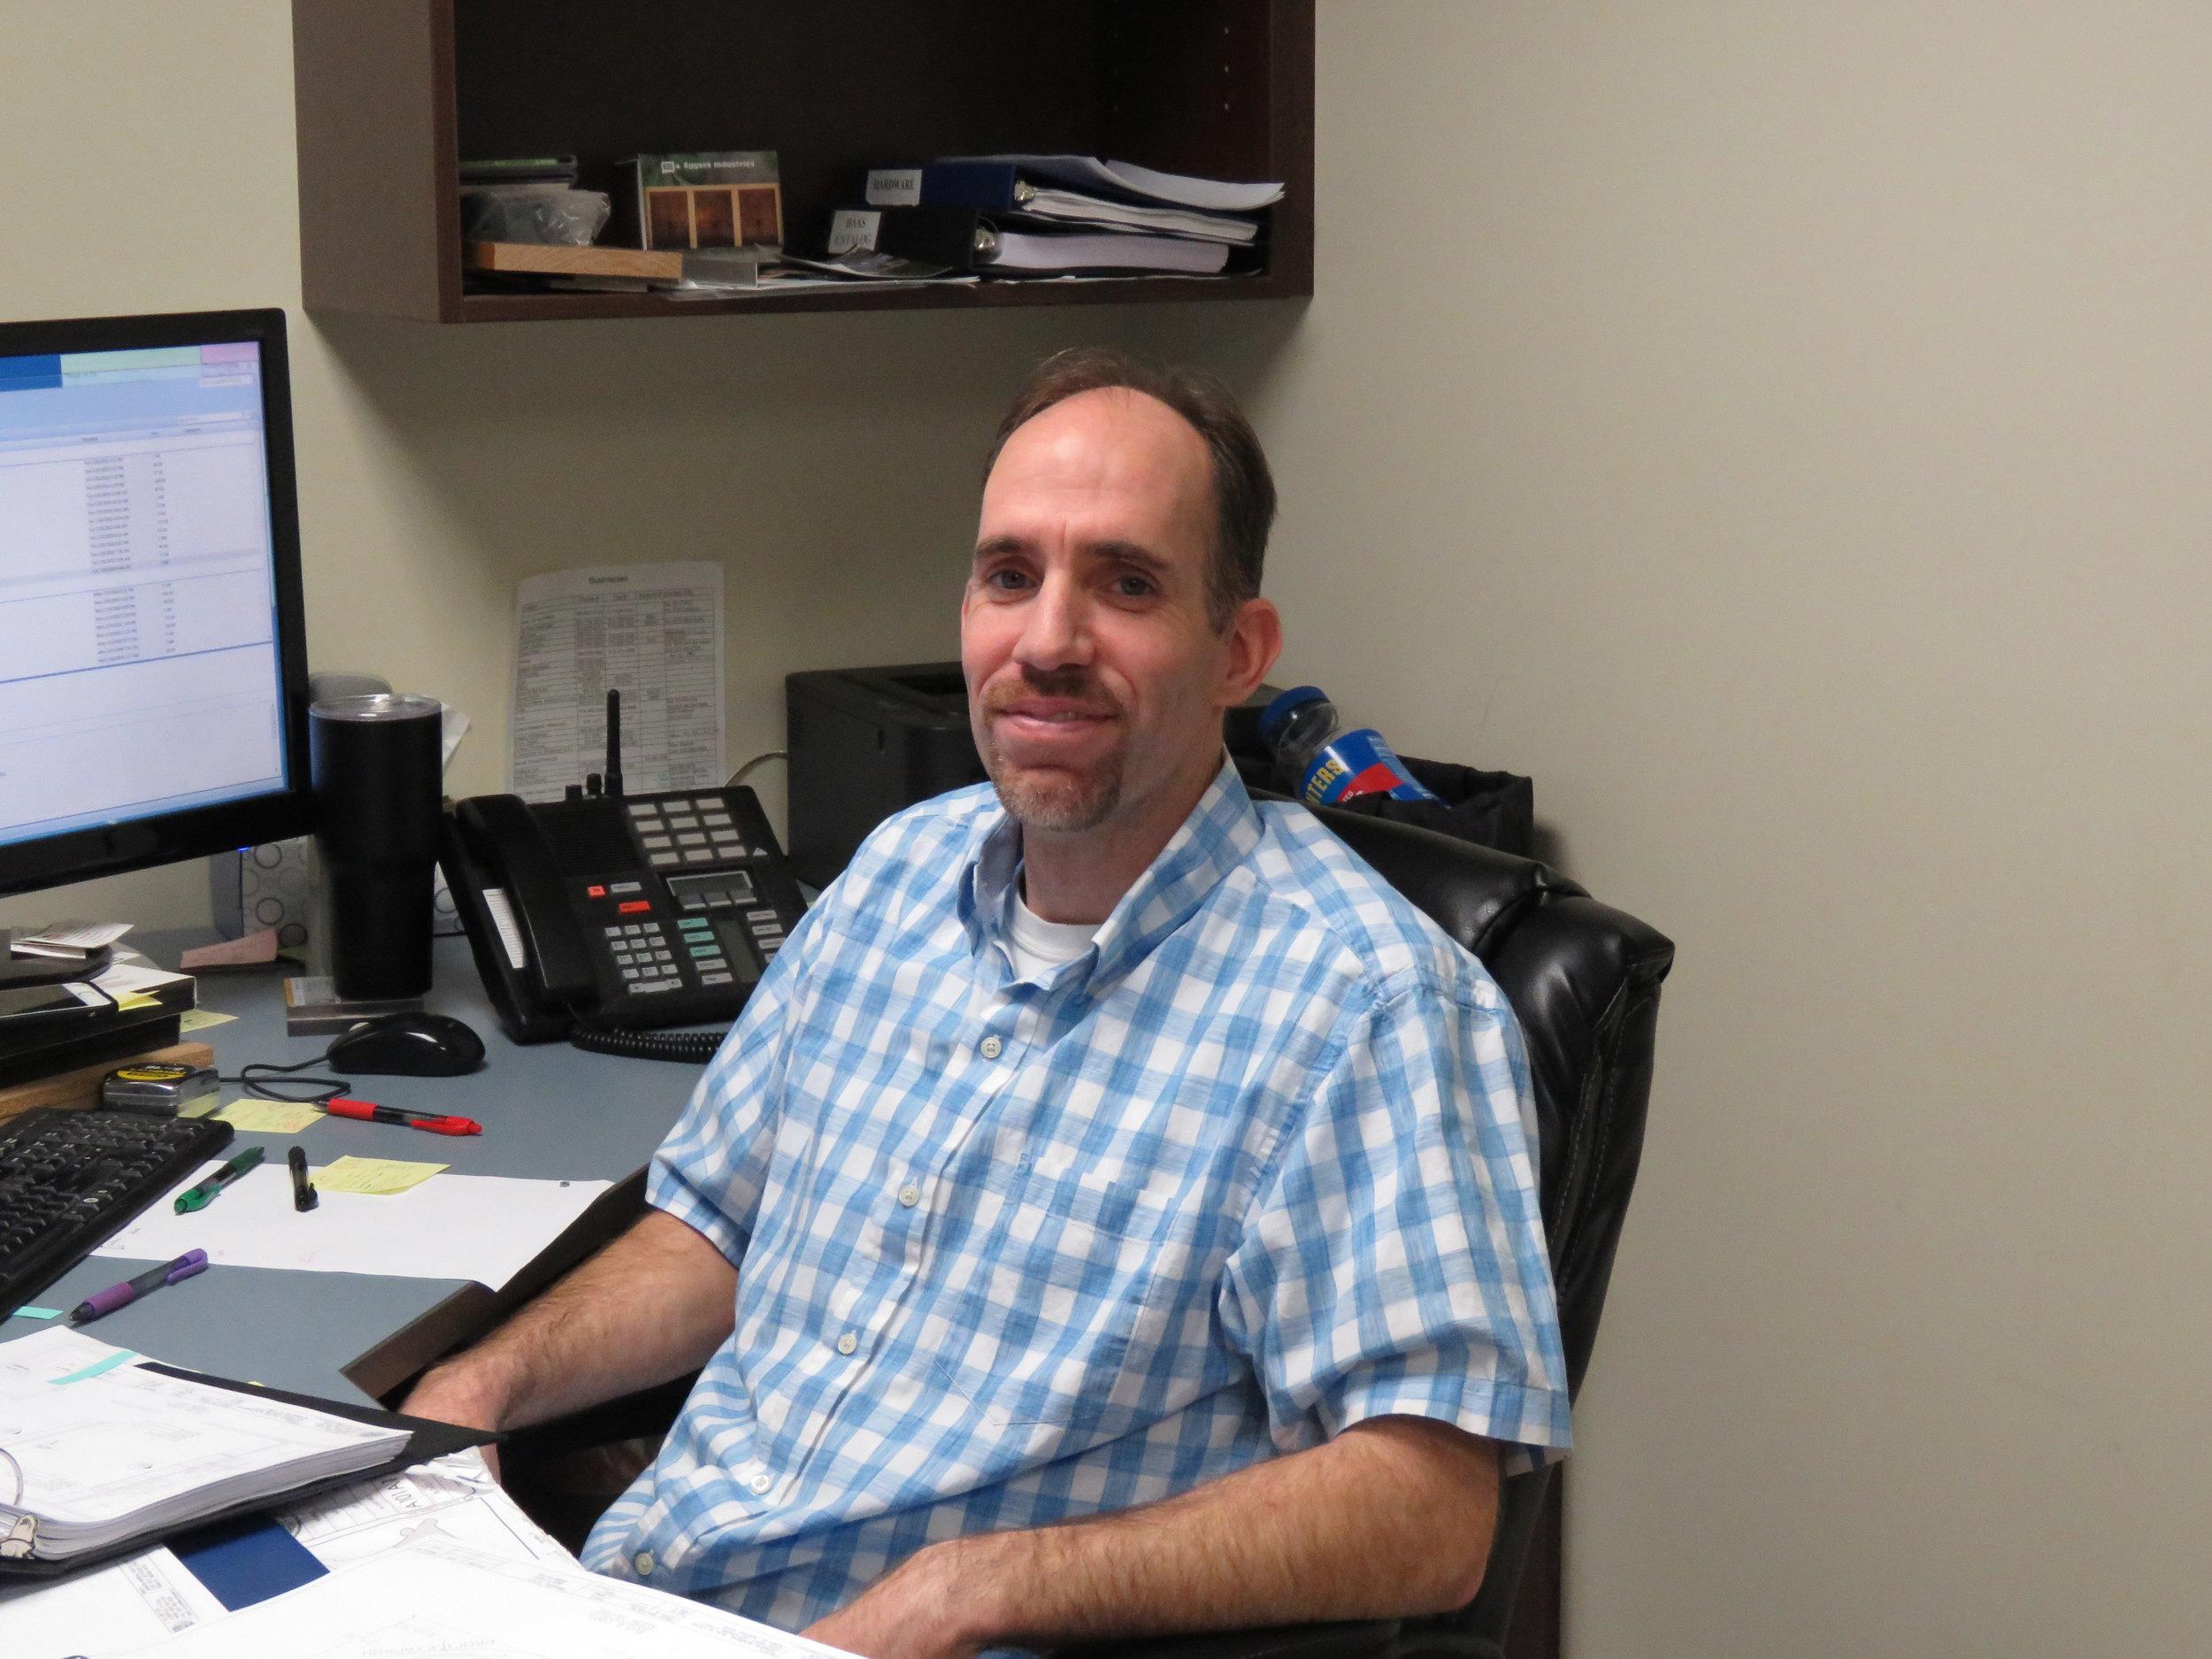 Jason Spindler - Lead Engineer